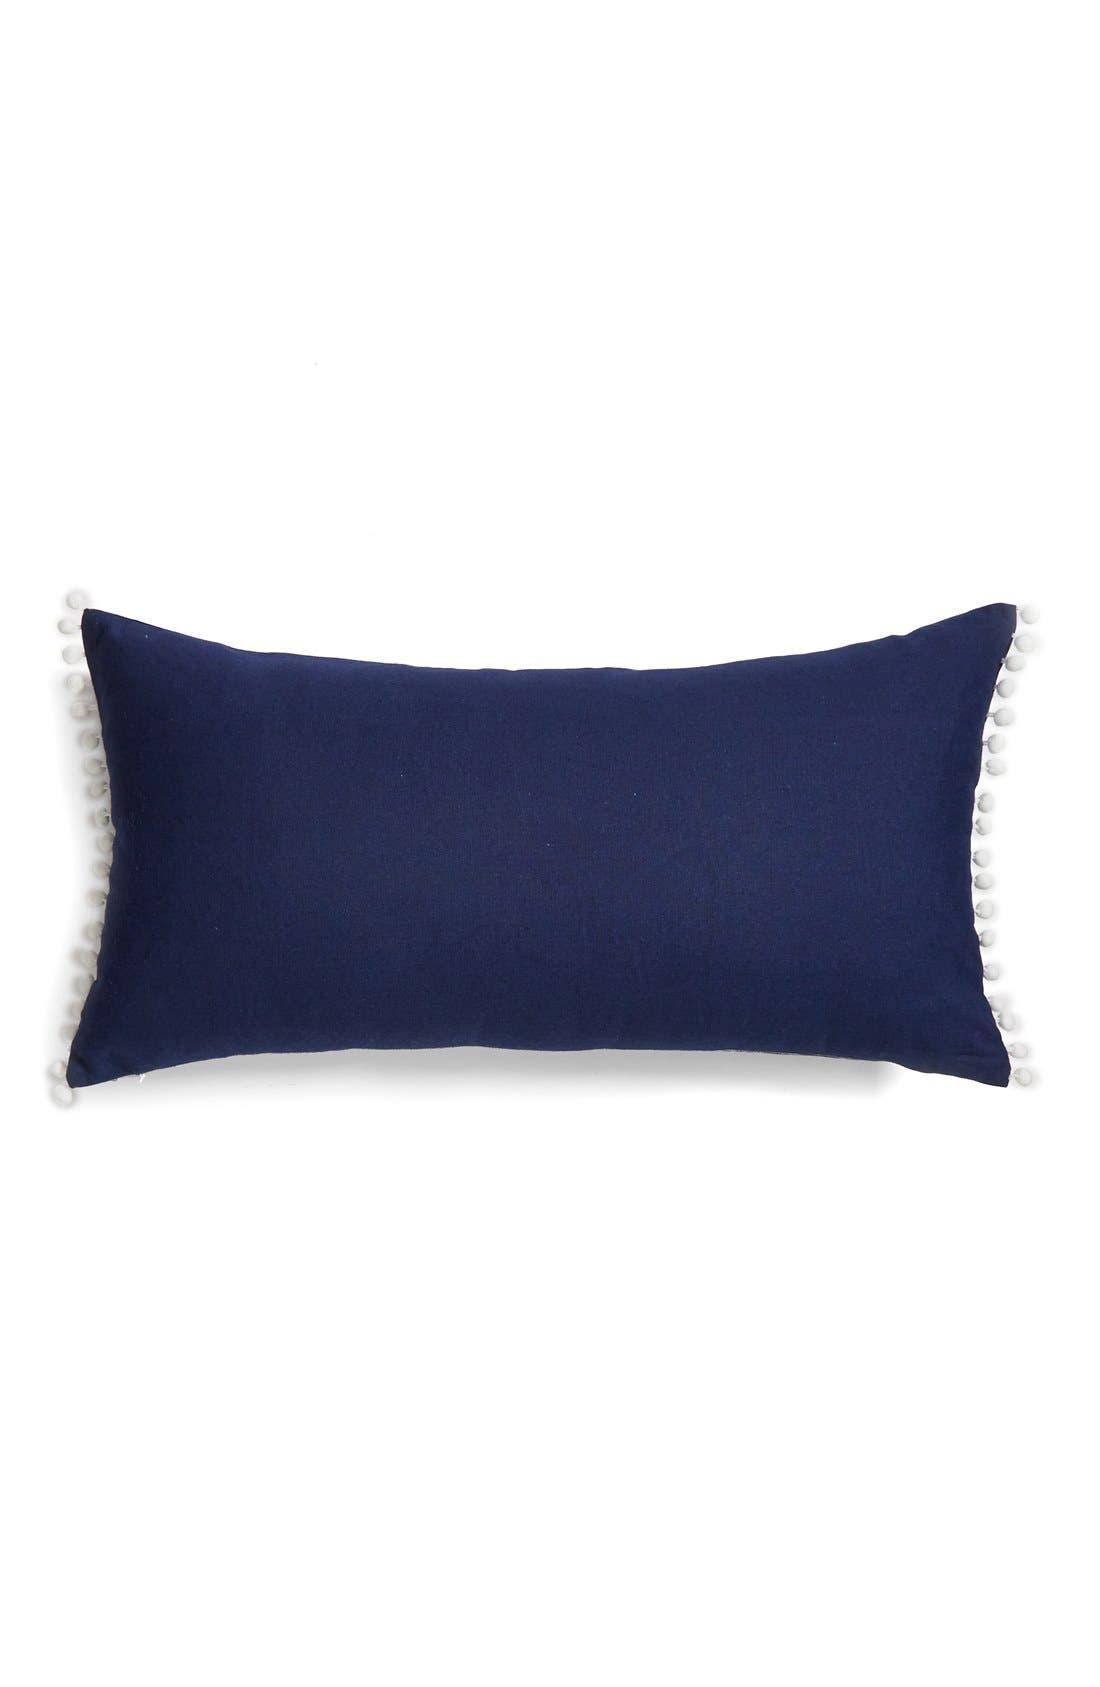 Alternate Image 2  - Levtex 'Inspire' Pom Pom Pillow